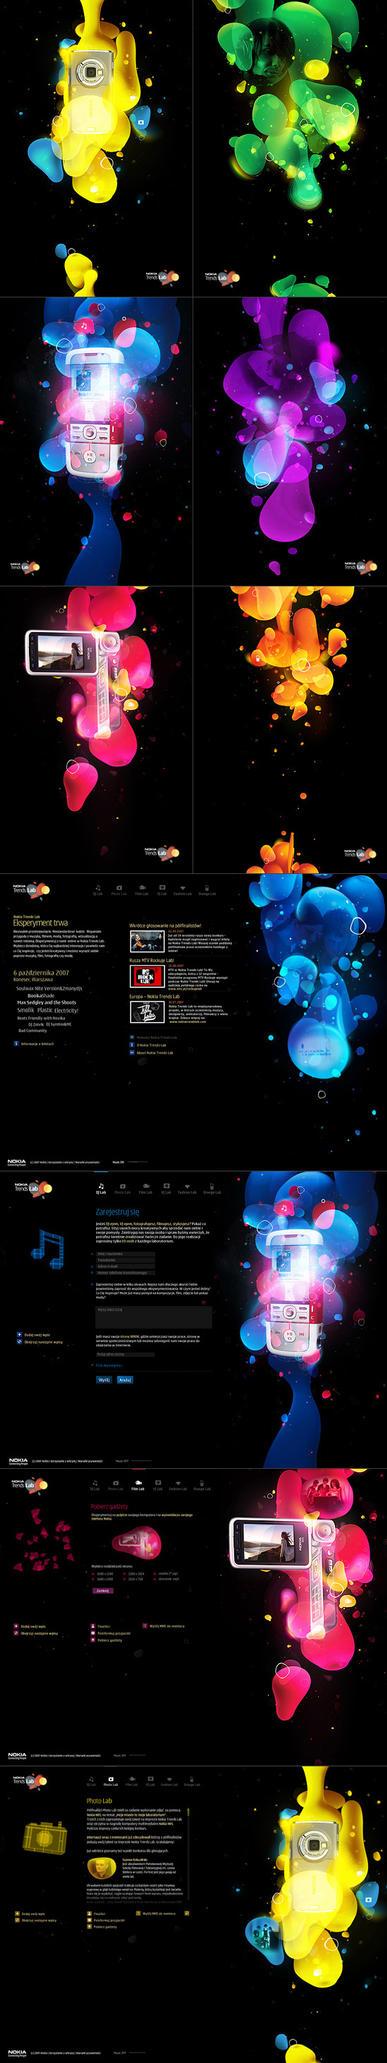 Nokia Trends Lab by he1z